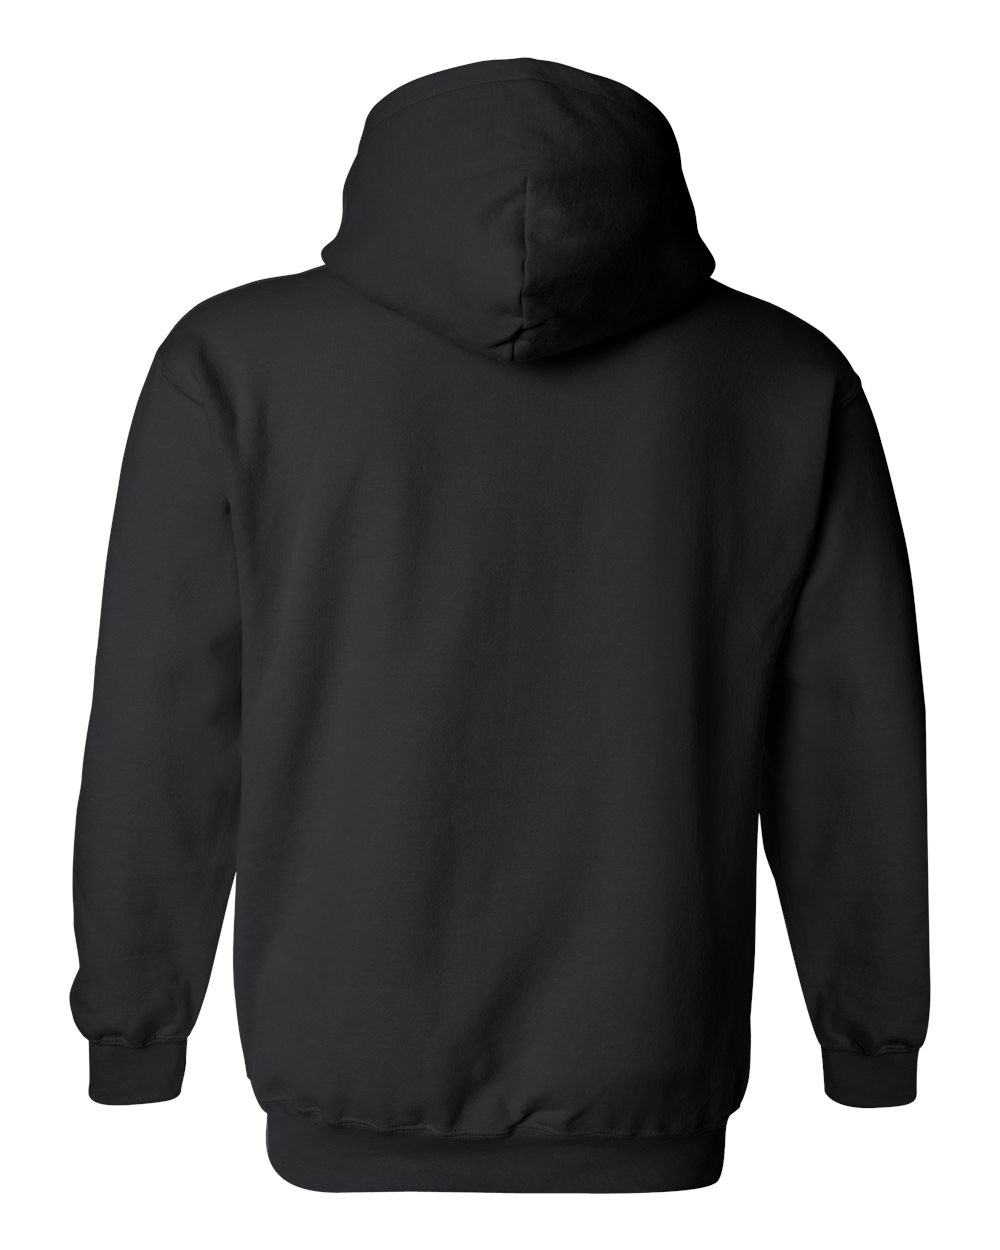 Gildan-Mens-Blank-Hoodie-Heavy-Blend-Hooded-Sweatshirt-Solid-18500-up-to-5XL thumbnail 10